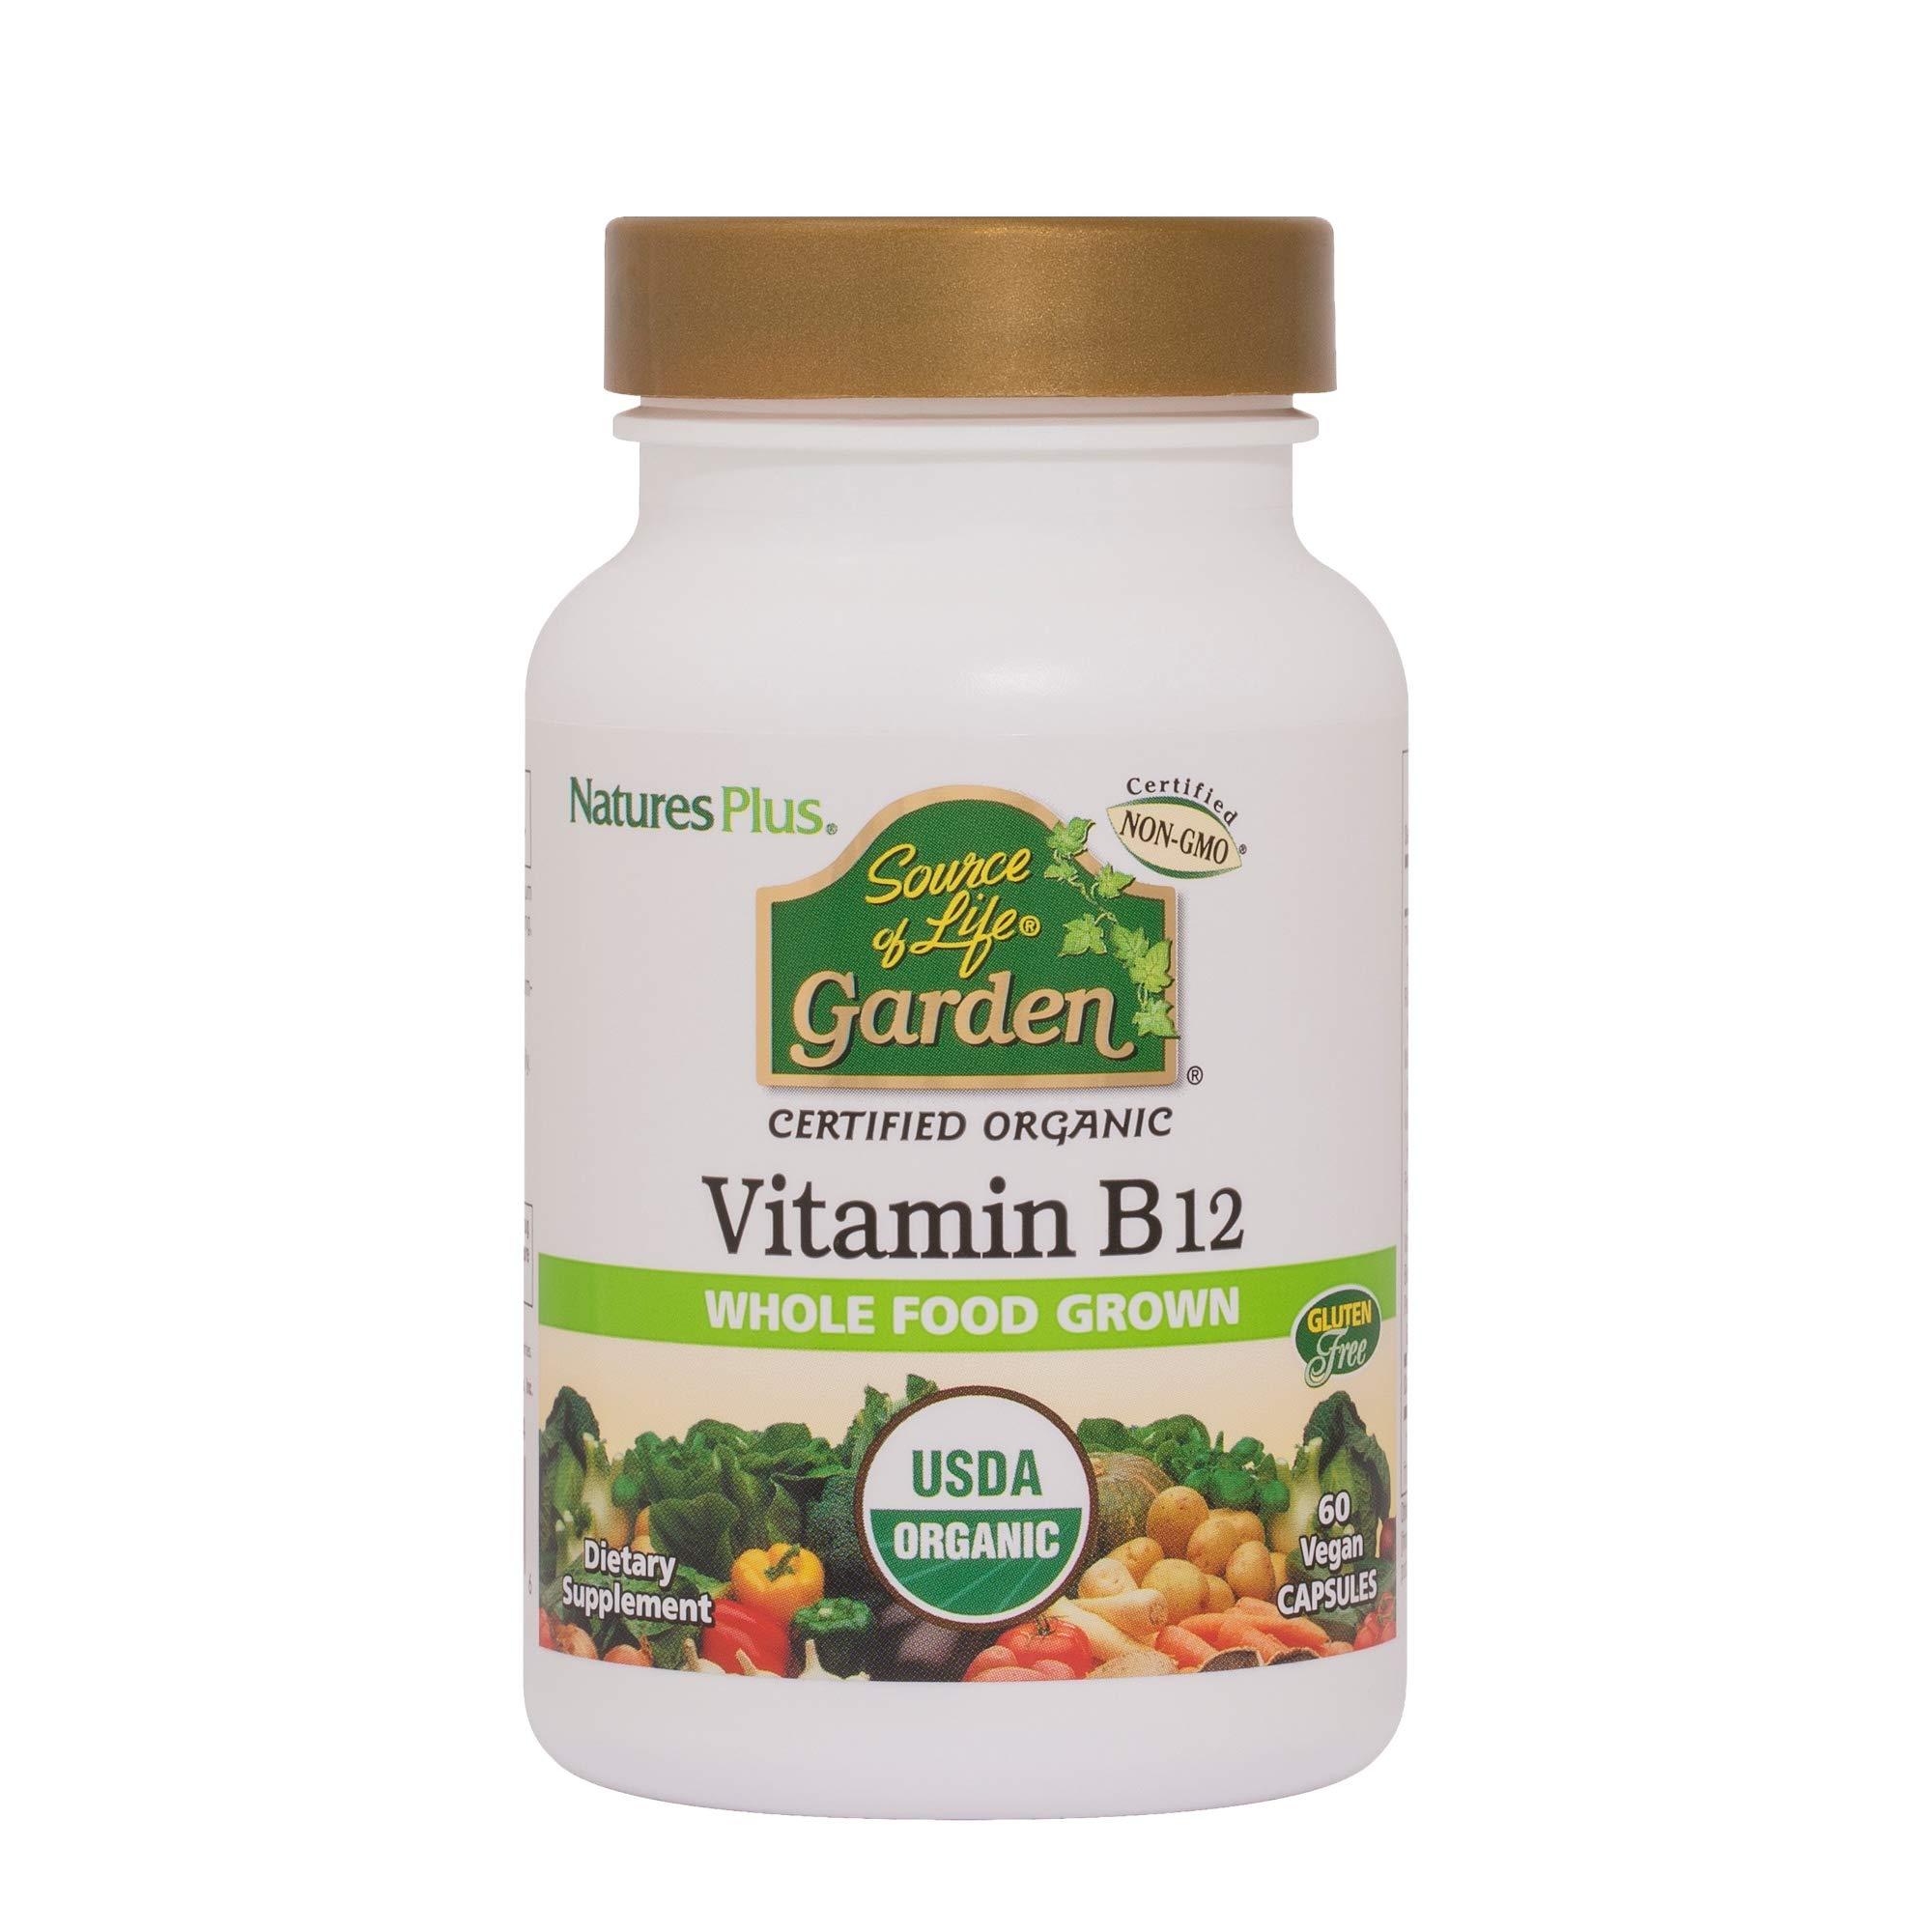 NaturesPlus Source of Life Garden Certified Organic Vitamin B12-1000 mcg methylcobalamin, 60 Vegan Capsules - Whole Food Vitamin B12 Supplement - Energy Boost - Vegetarian, Gluten-Free - 60 Servings